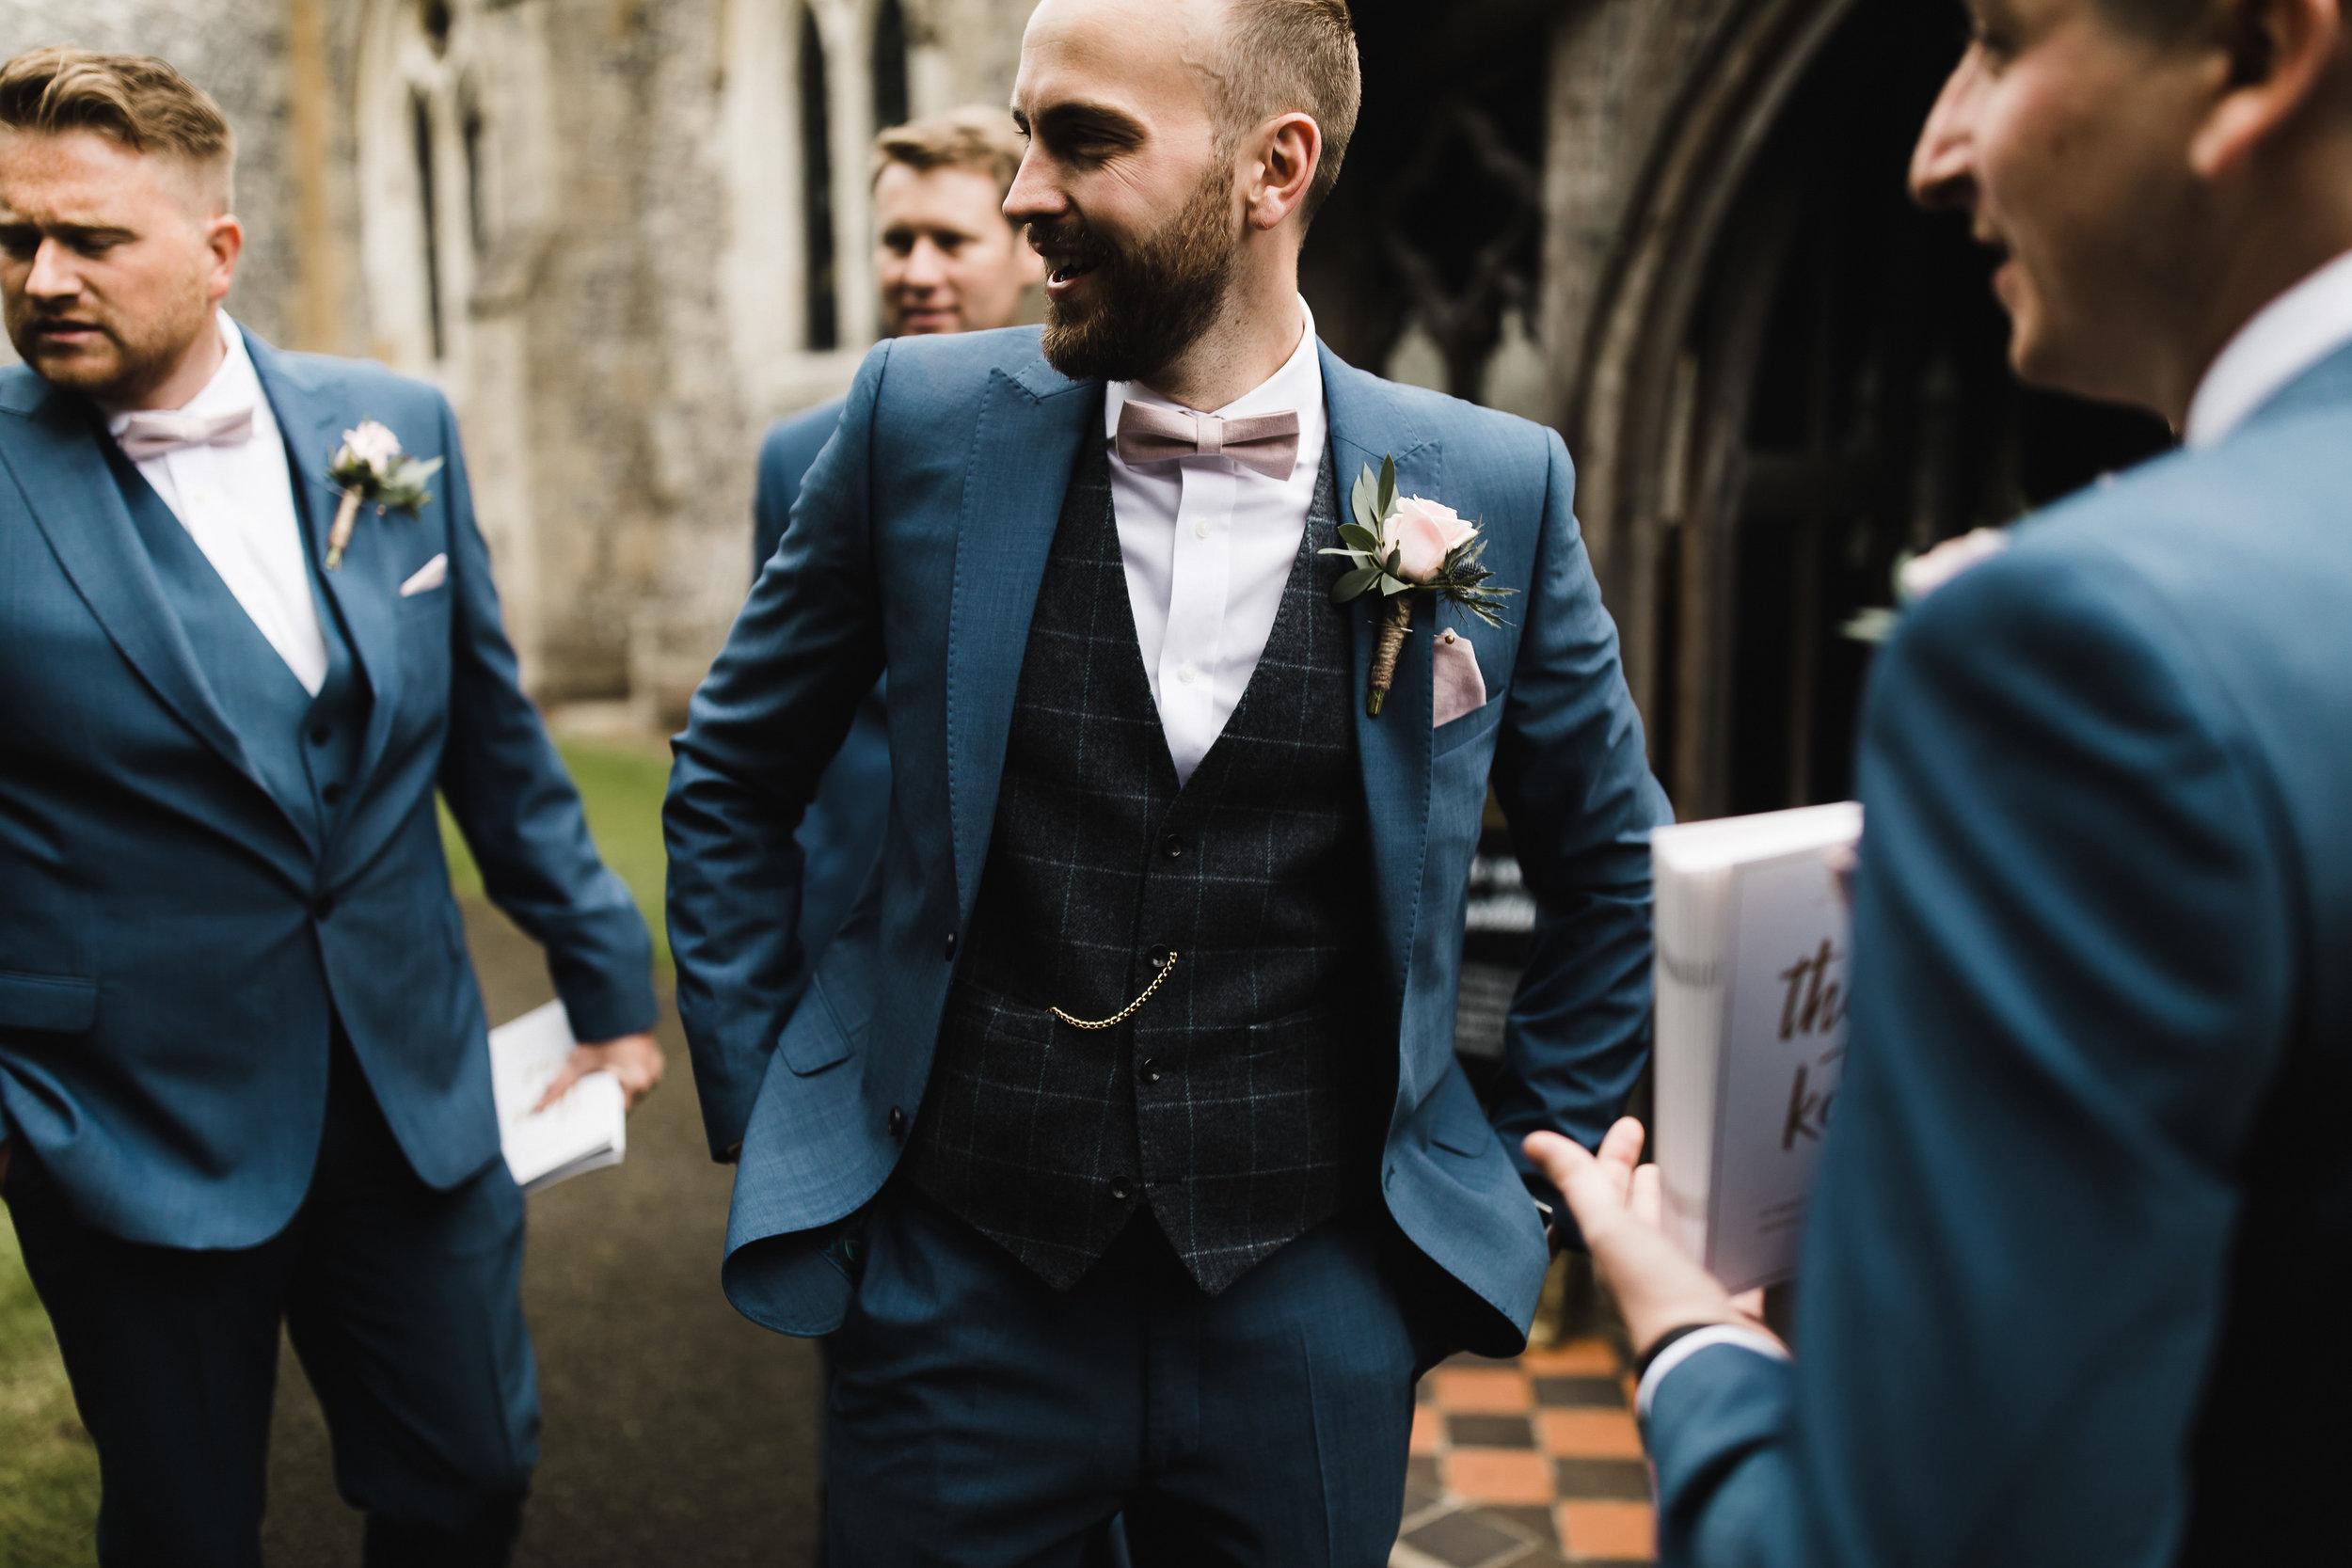 Nether_Wichendon_House_Wedding_013.jpg